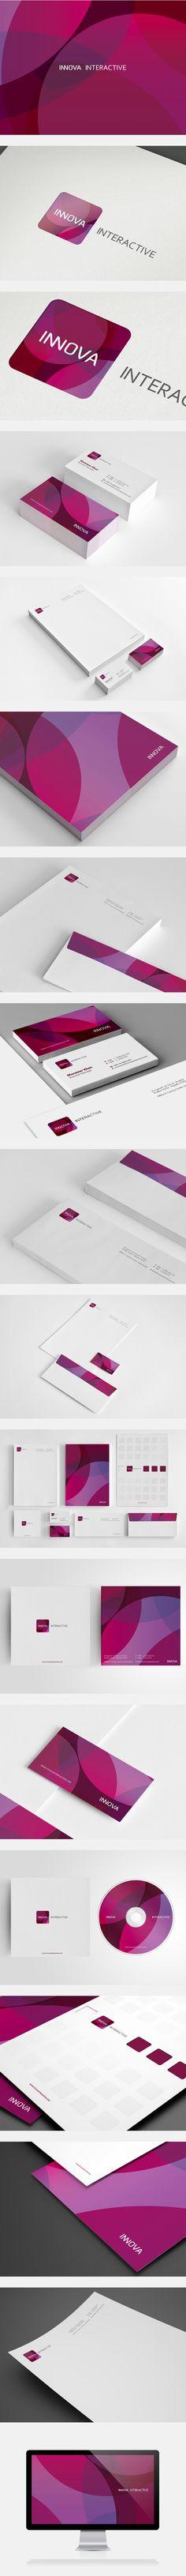 logo design - branding - Innova Interactive Identity - cool presentation #ccscolour